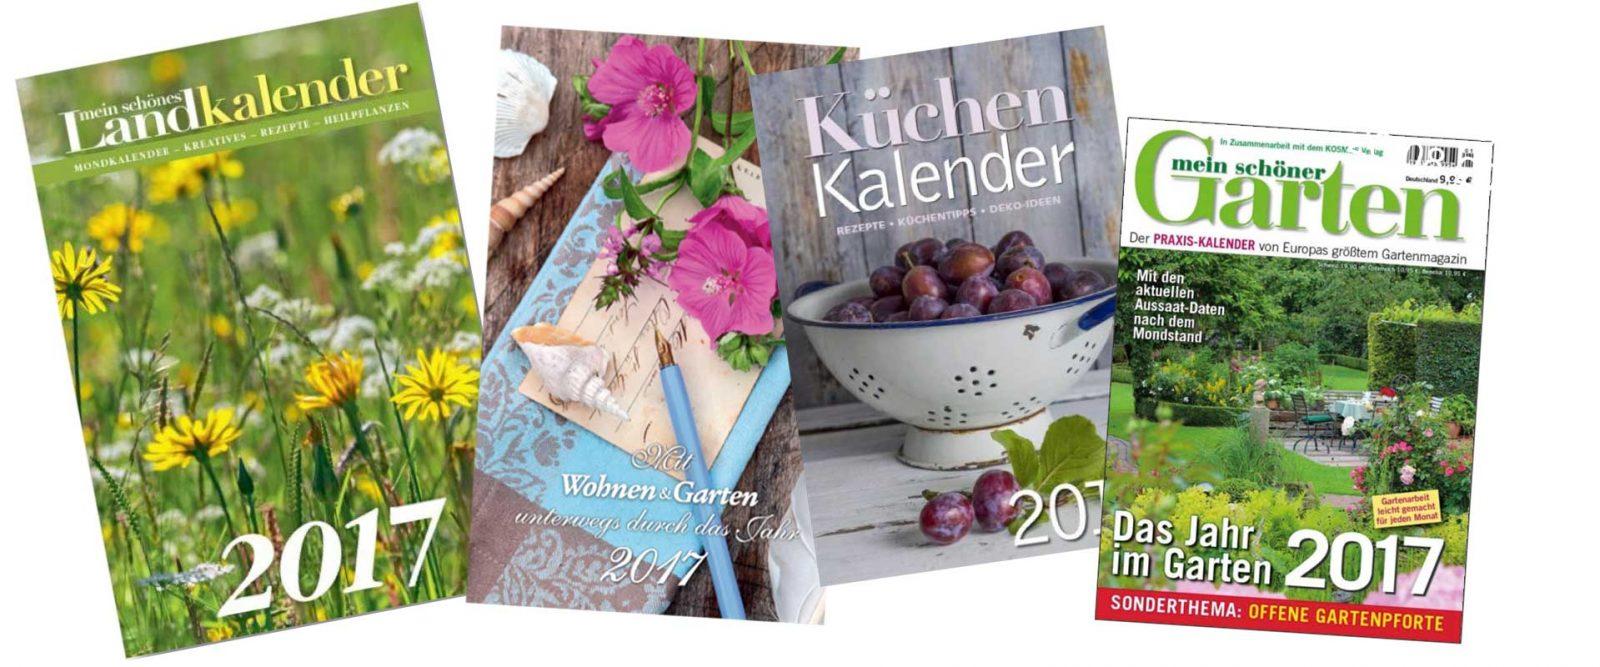 Kalender slider